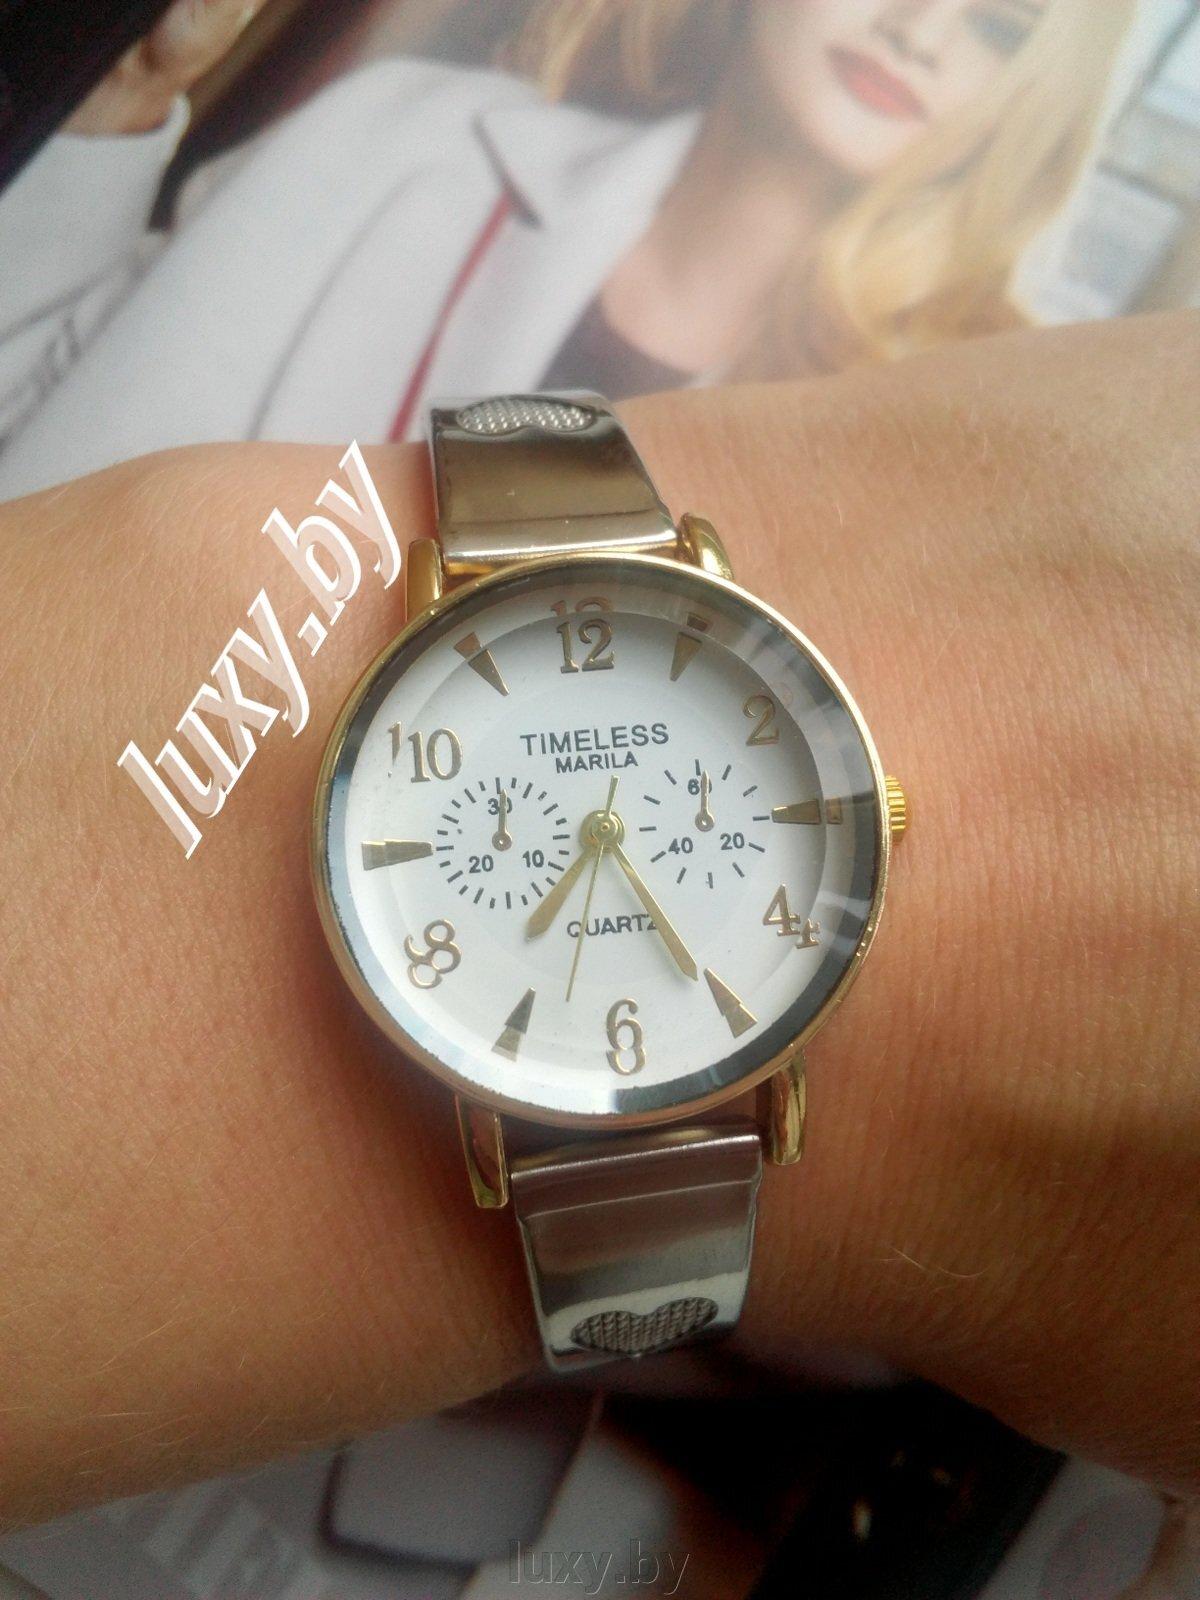 Часы наручные женские со стальным ремешком, арт.Н-15 - фото pic_779bf528db9a4e0_1920x9000_1.jpg